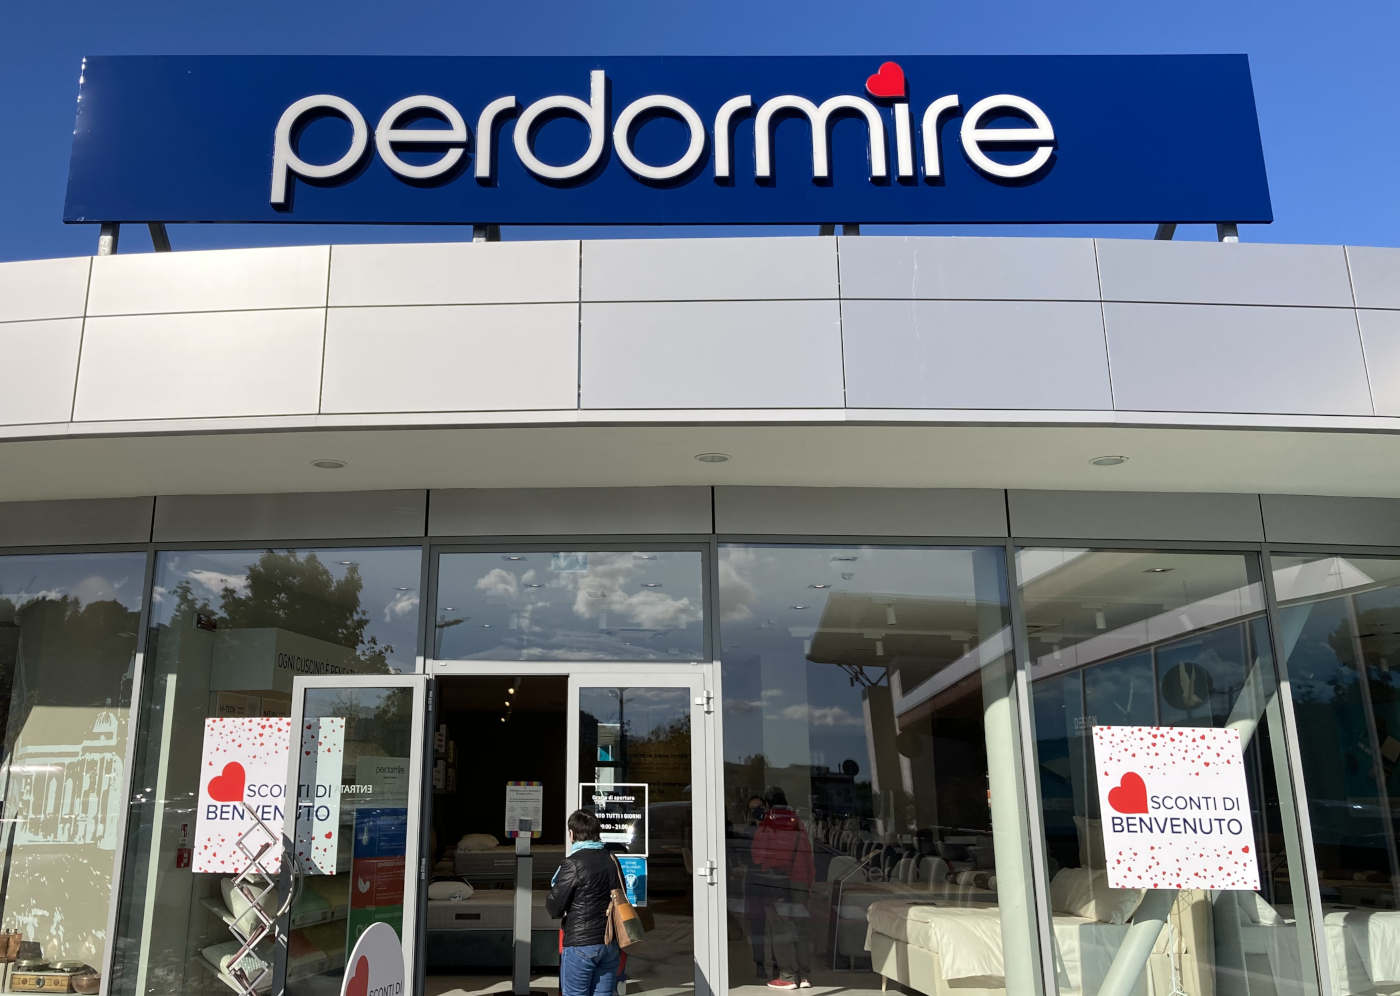 alBattente_perdormire_home